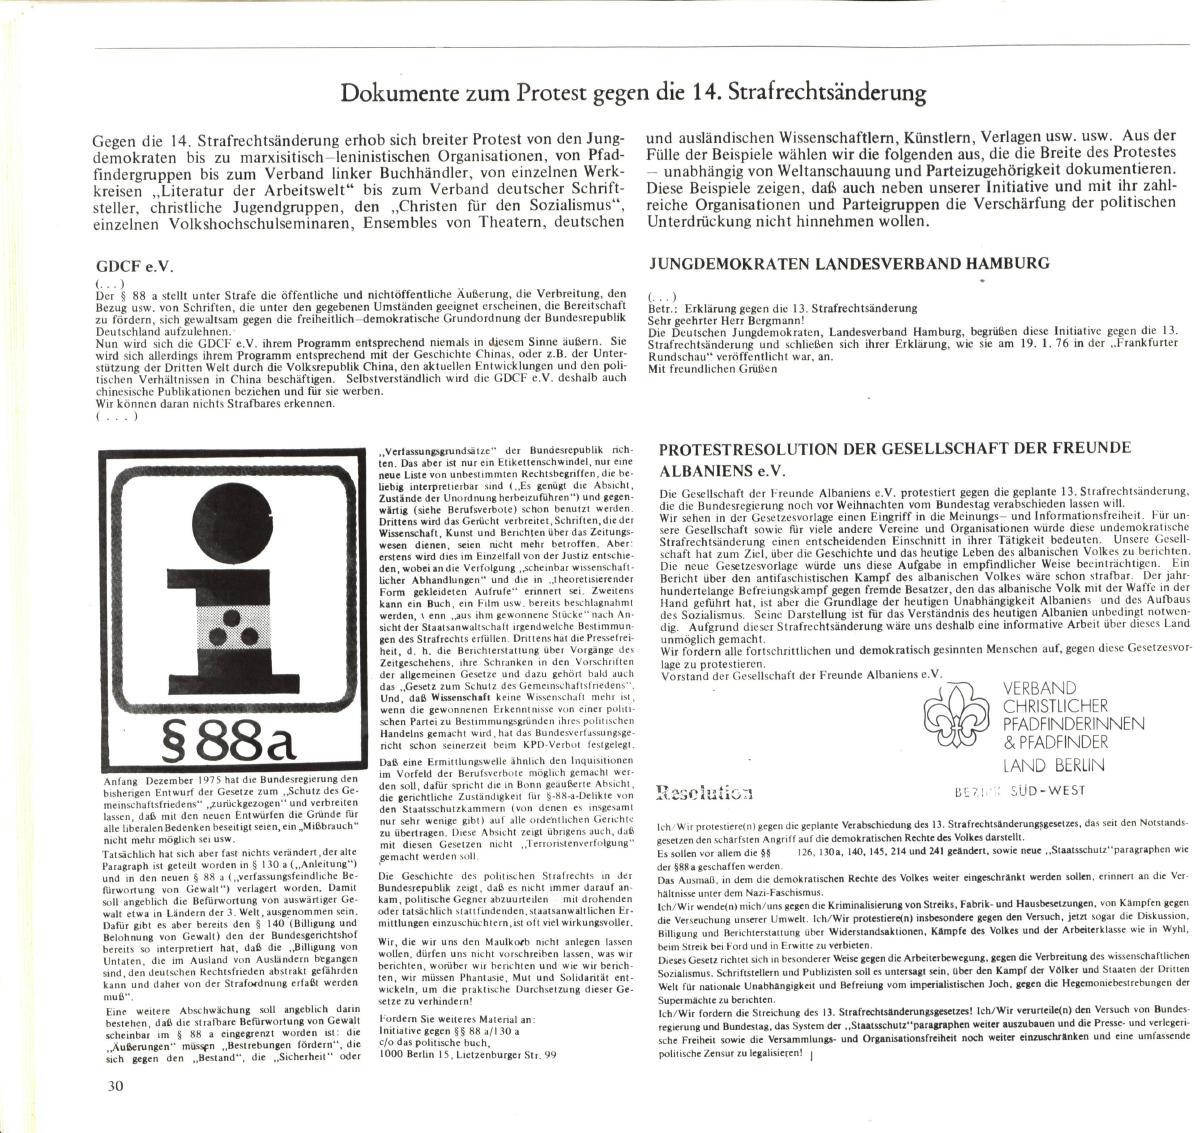 REP_VLB_1976_Die_Zensurgesetze_31